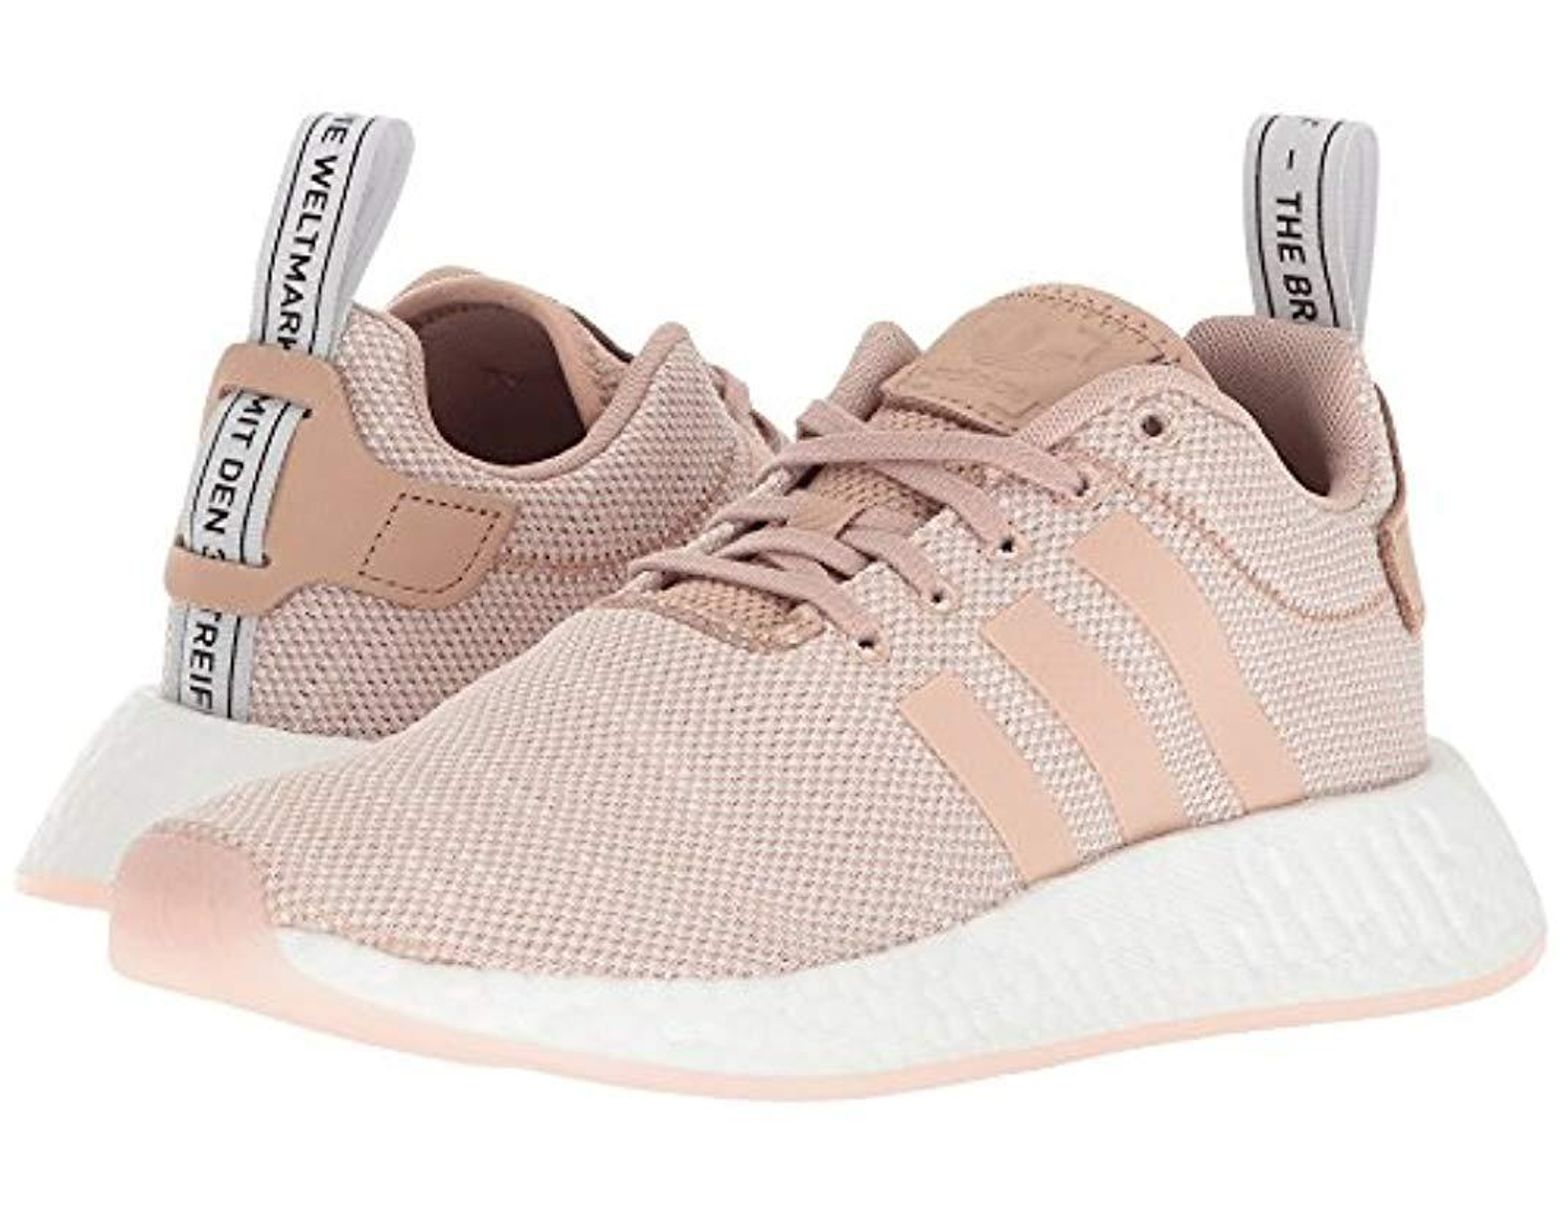 f94c759907f73 Women's Pink Nmd_r2 W Running Shoe